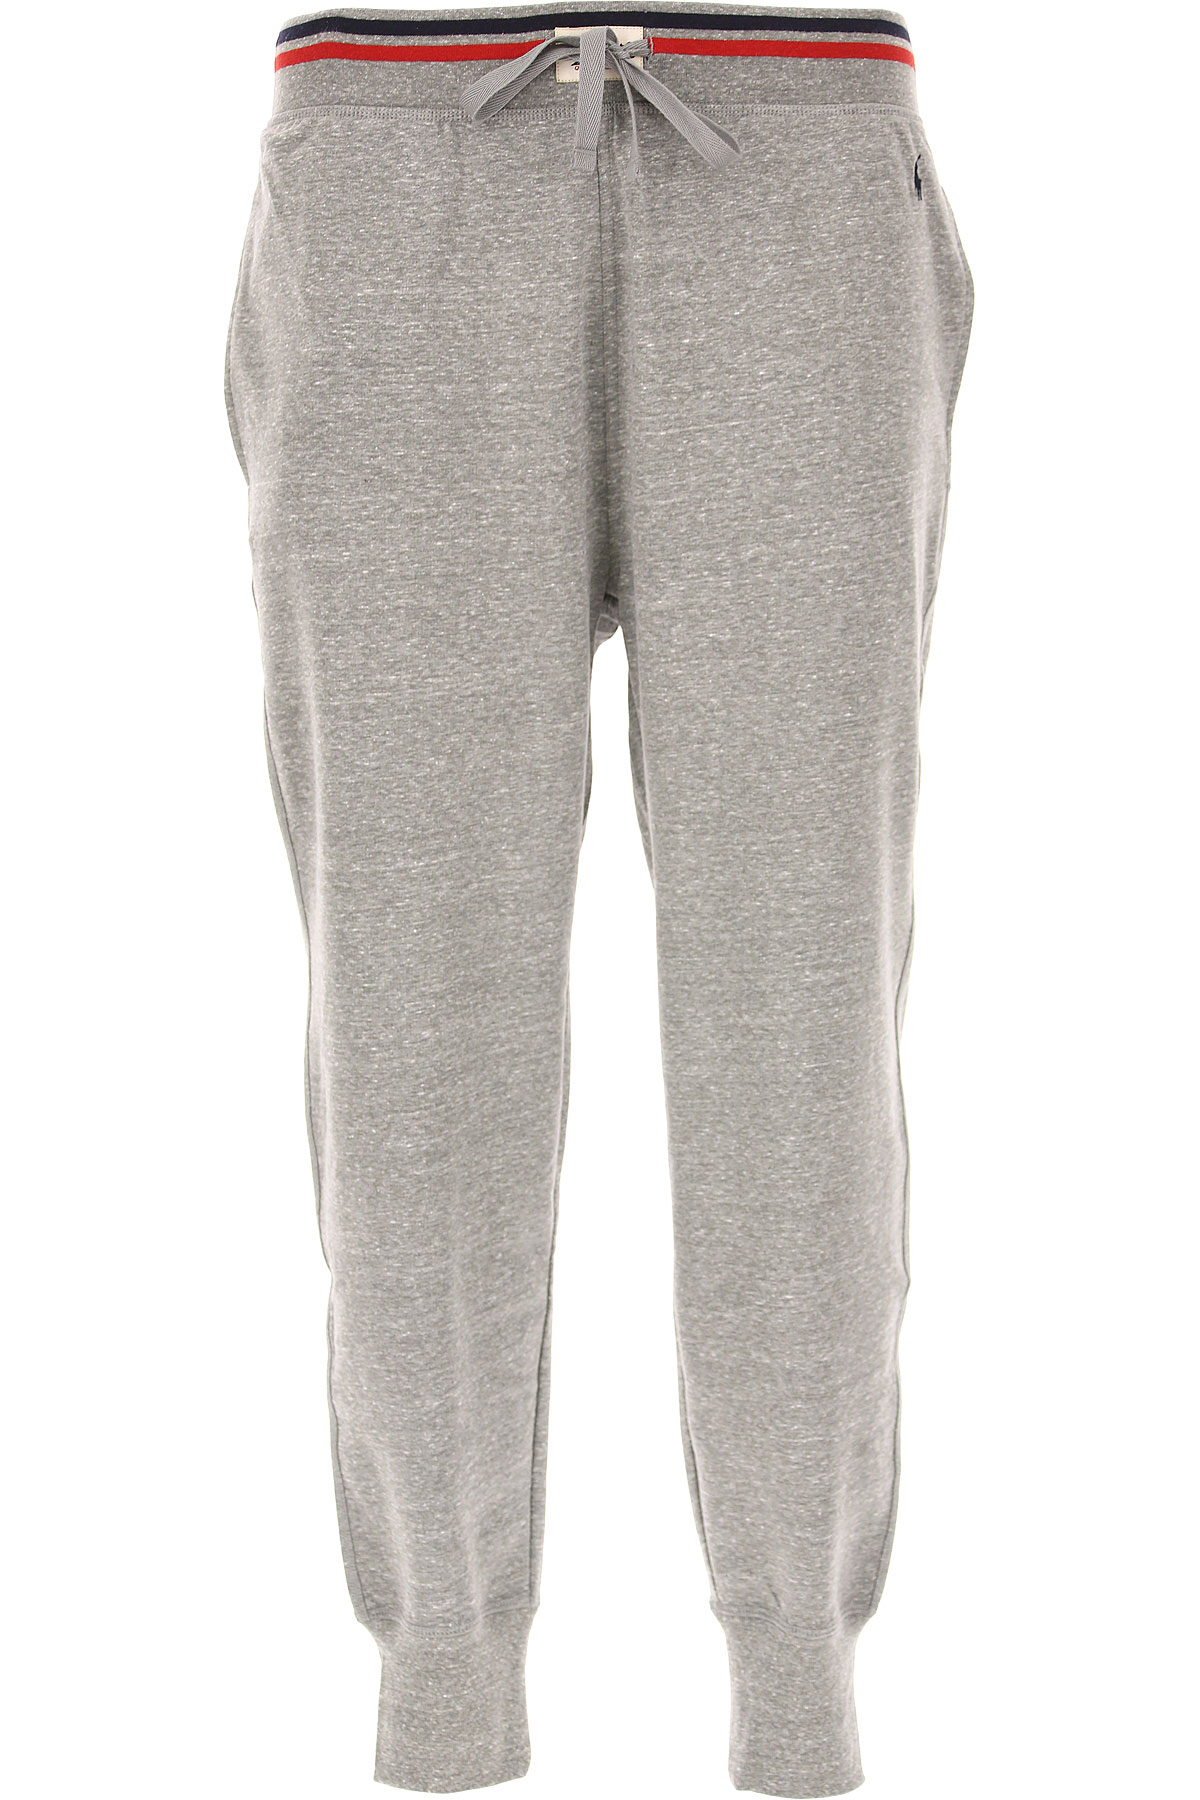 Ralph Lauren Pants for Men, Grey Heather, polyester, 2017, L L M M XL USA-438507